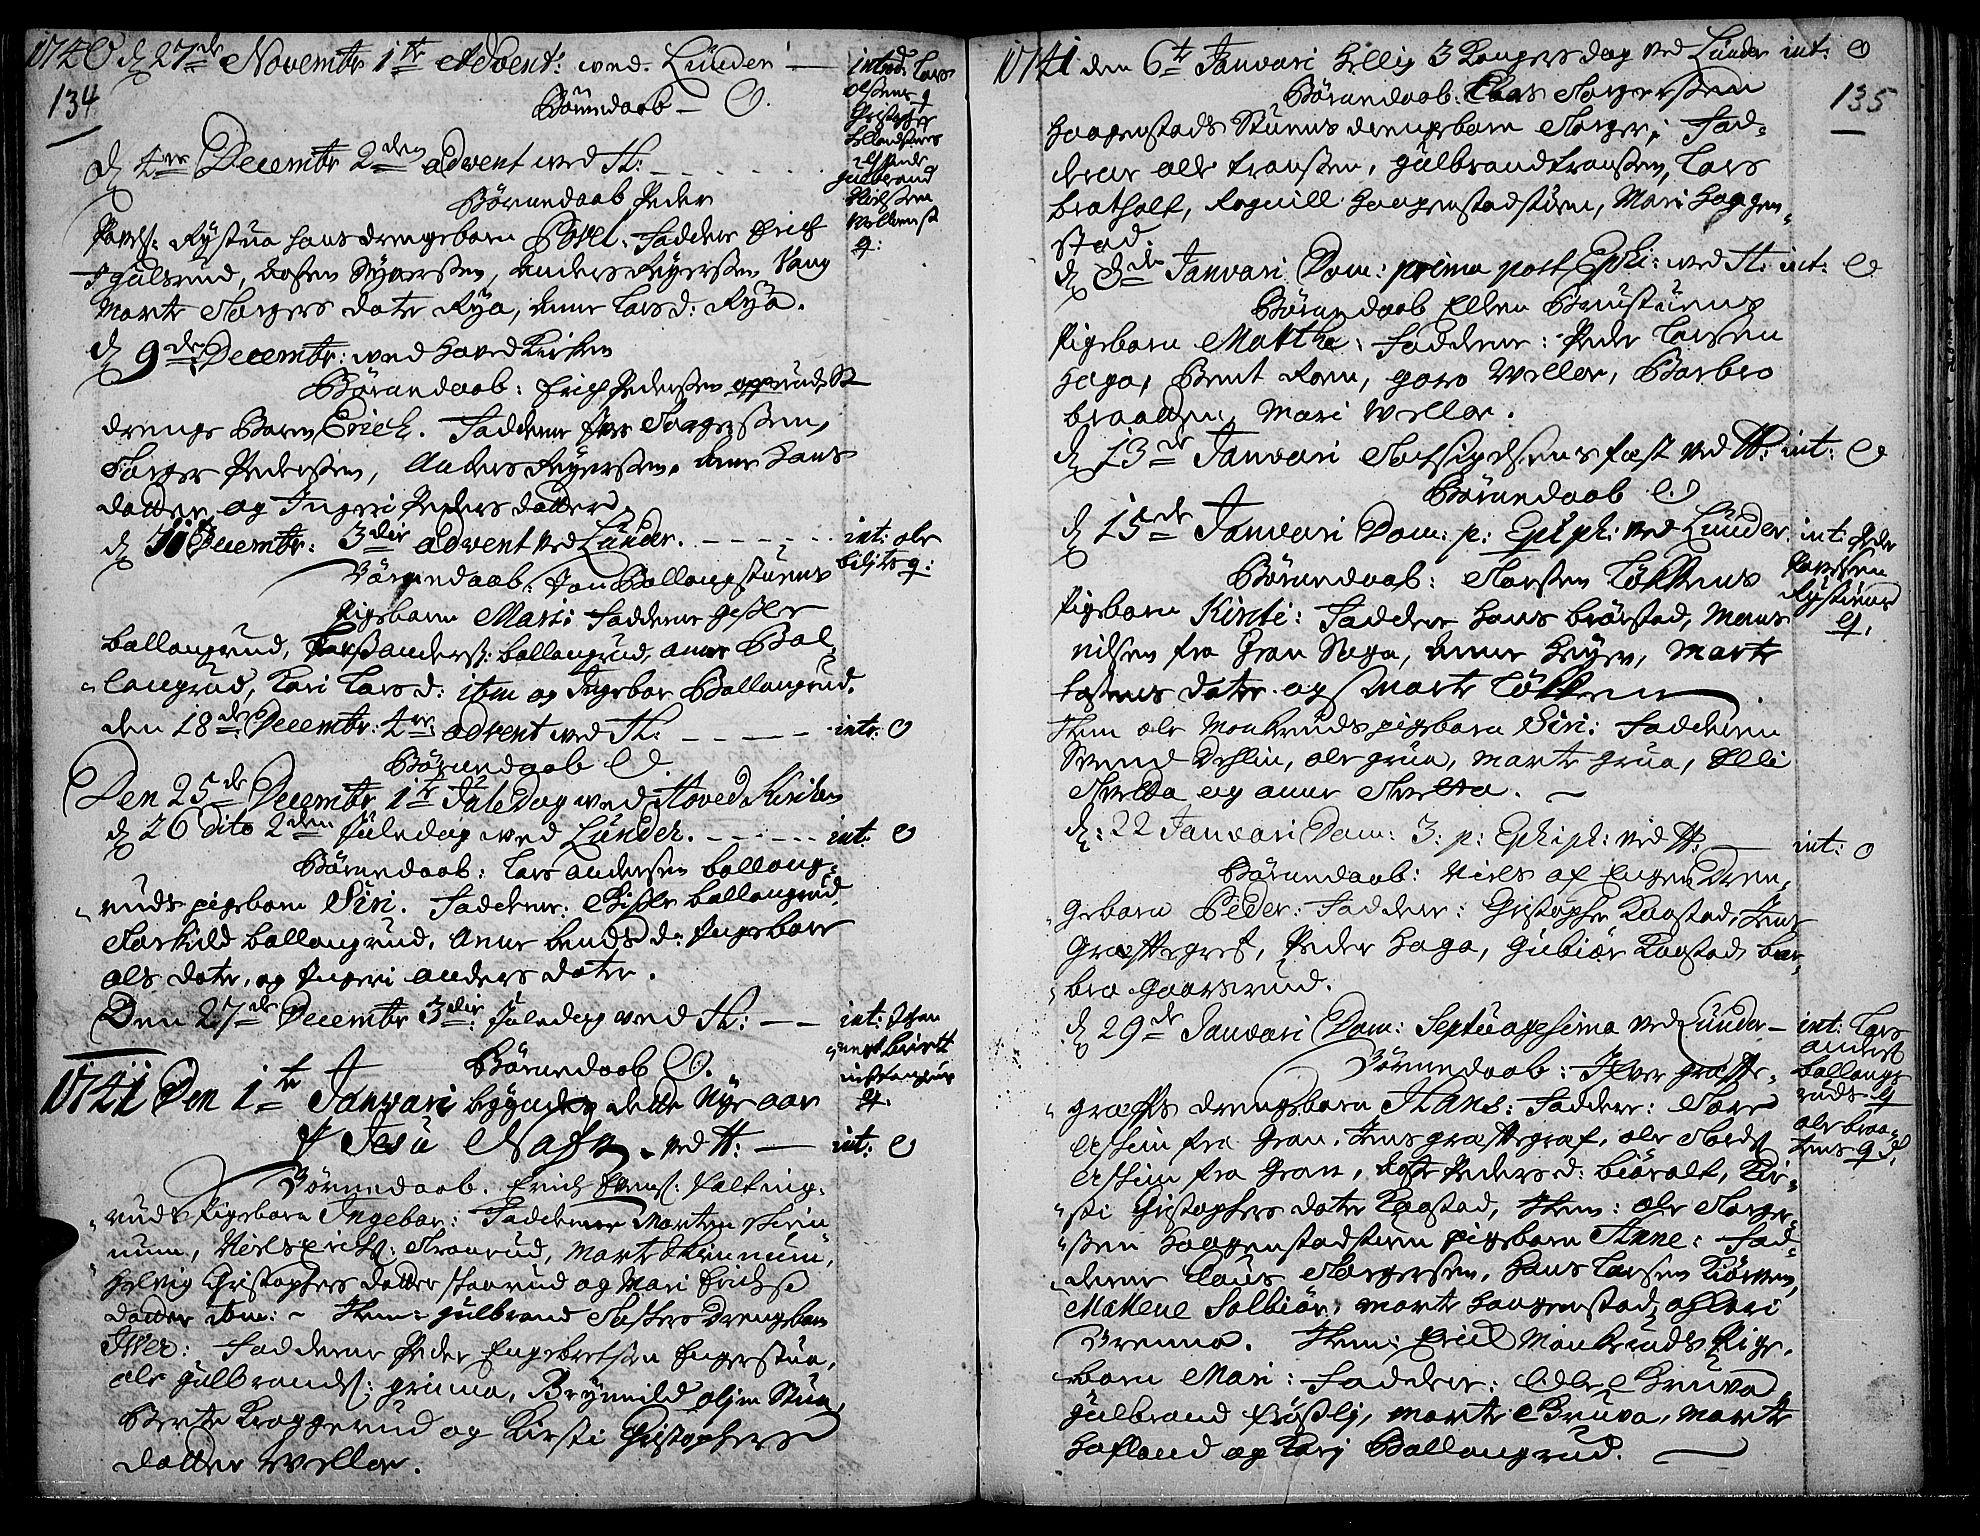 SAH, Jevnaker prestekontor, Ministerialbok nr. 2, 1725-1751, s. 134-135